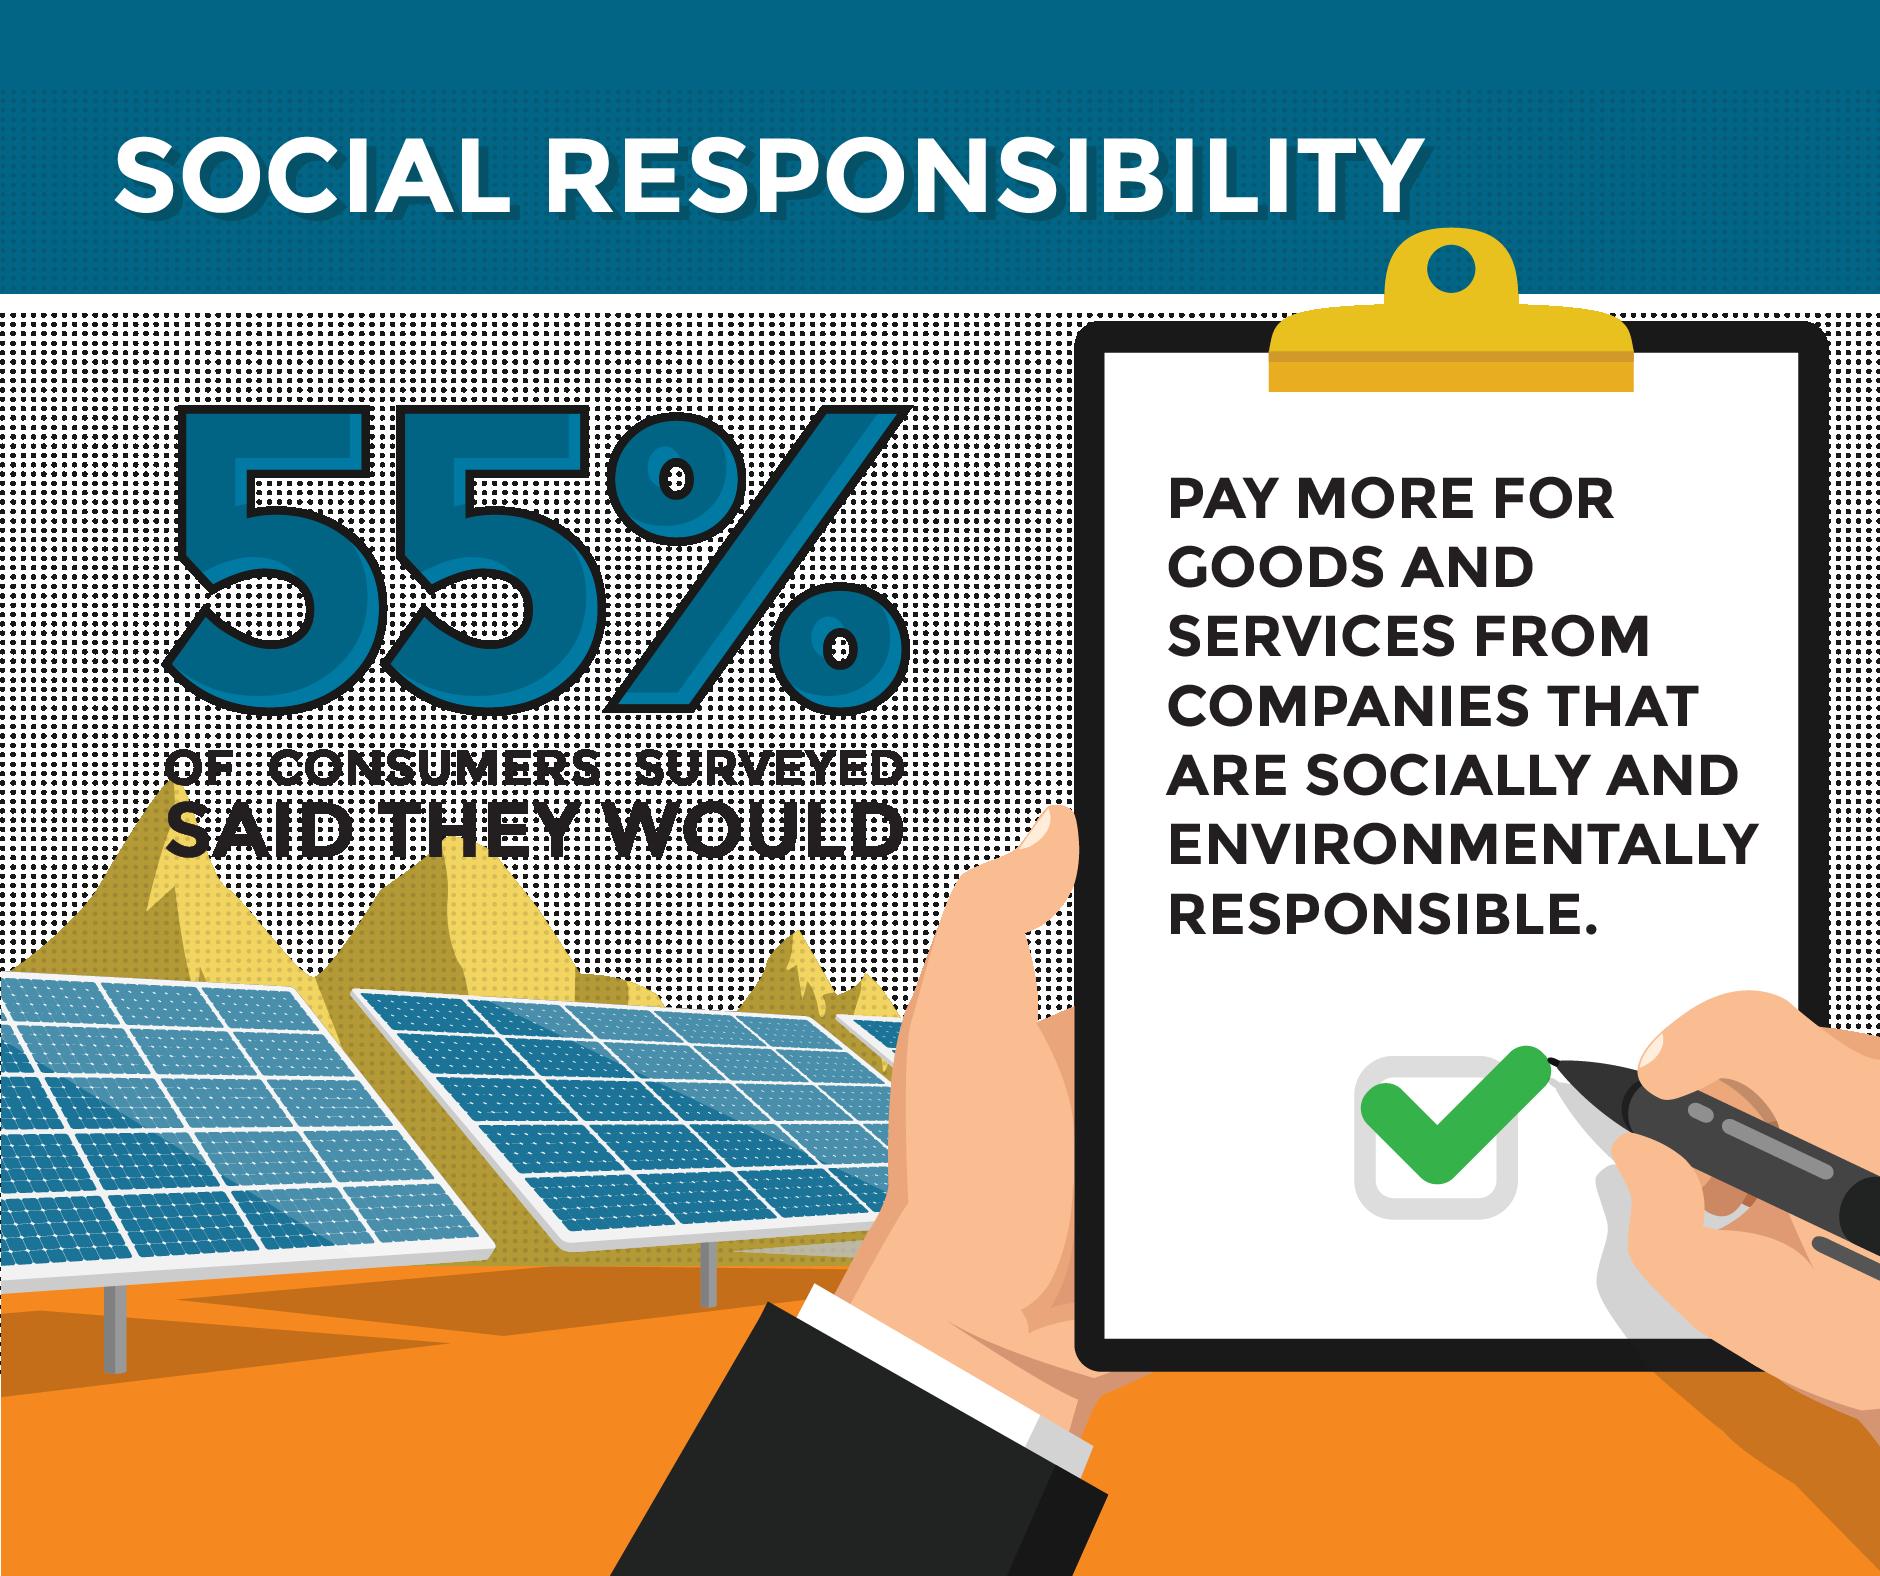 HAH - Innovation IG - 4 Social Responsibility PNG.png